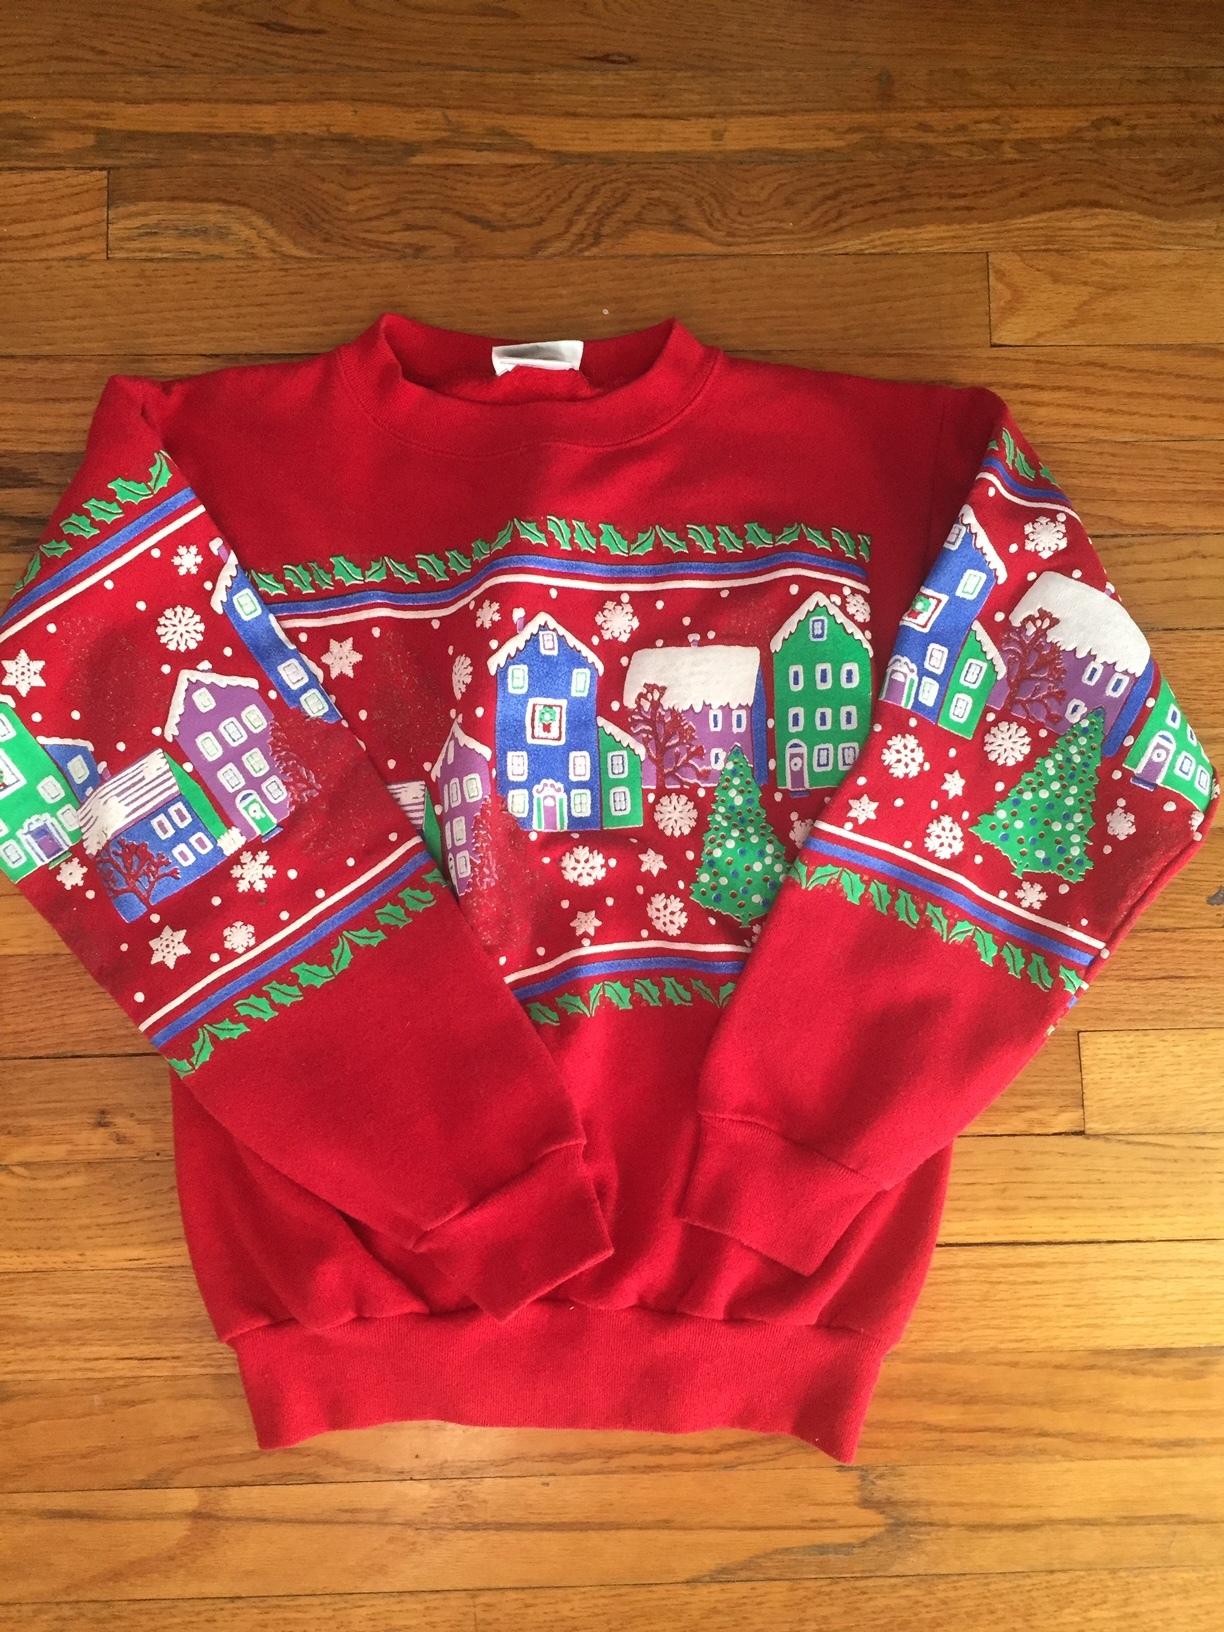 Vintage Christmas Sweaters.Vintage Christmas Sweater